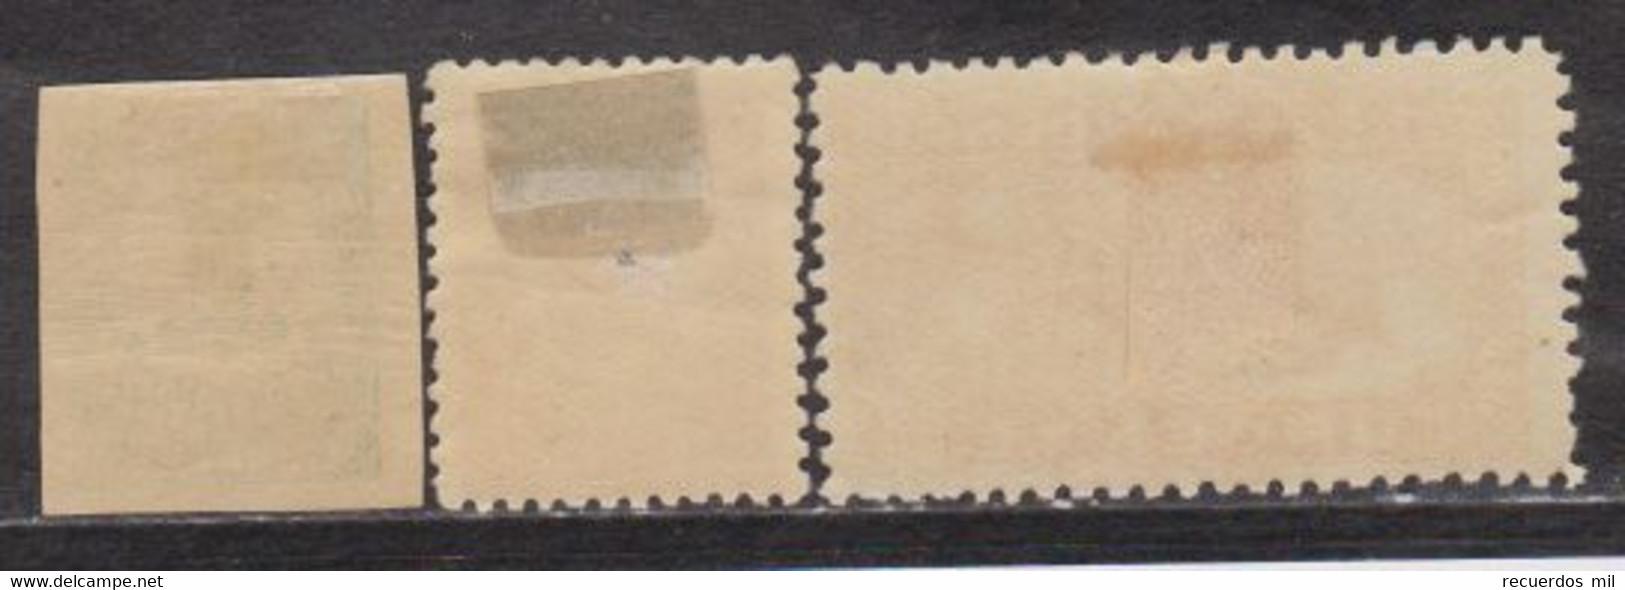 Año 1933-34 Edifil 677-678-679 - 1931-50 Ungebraucht